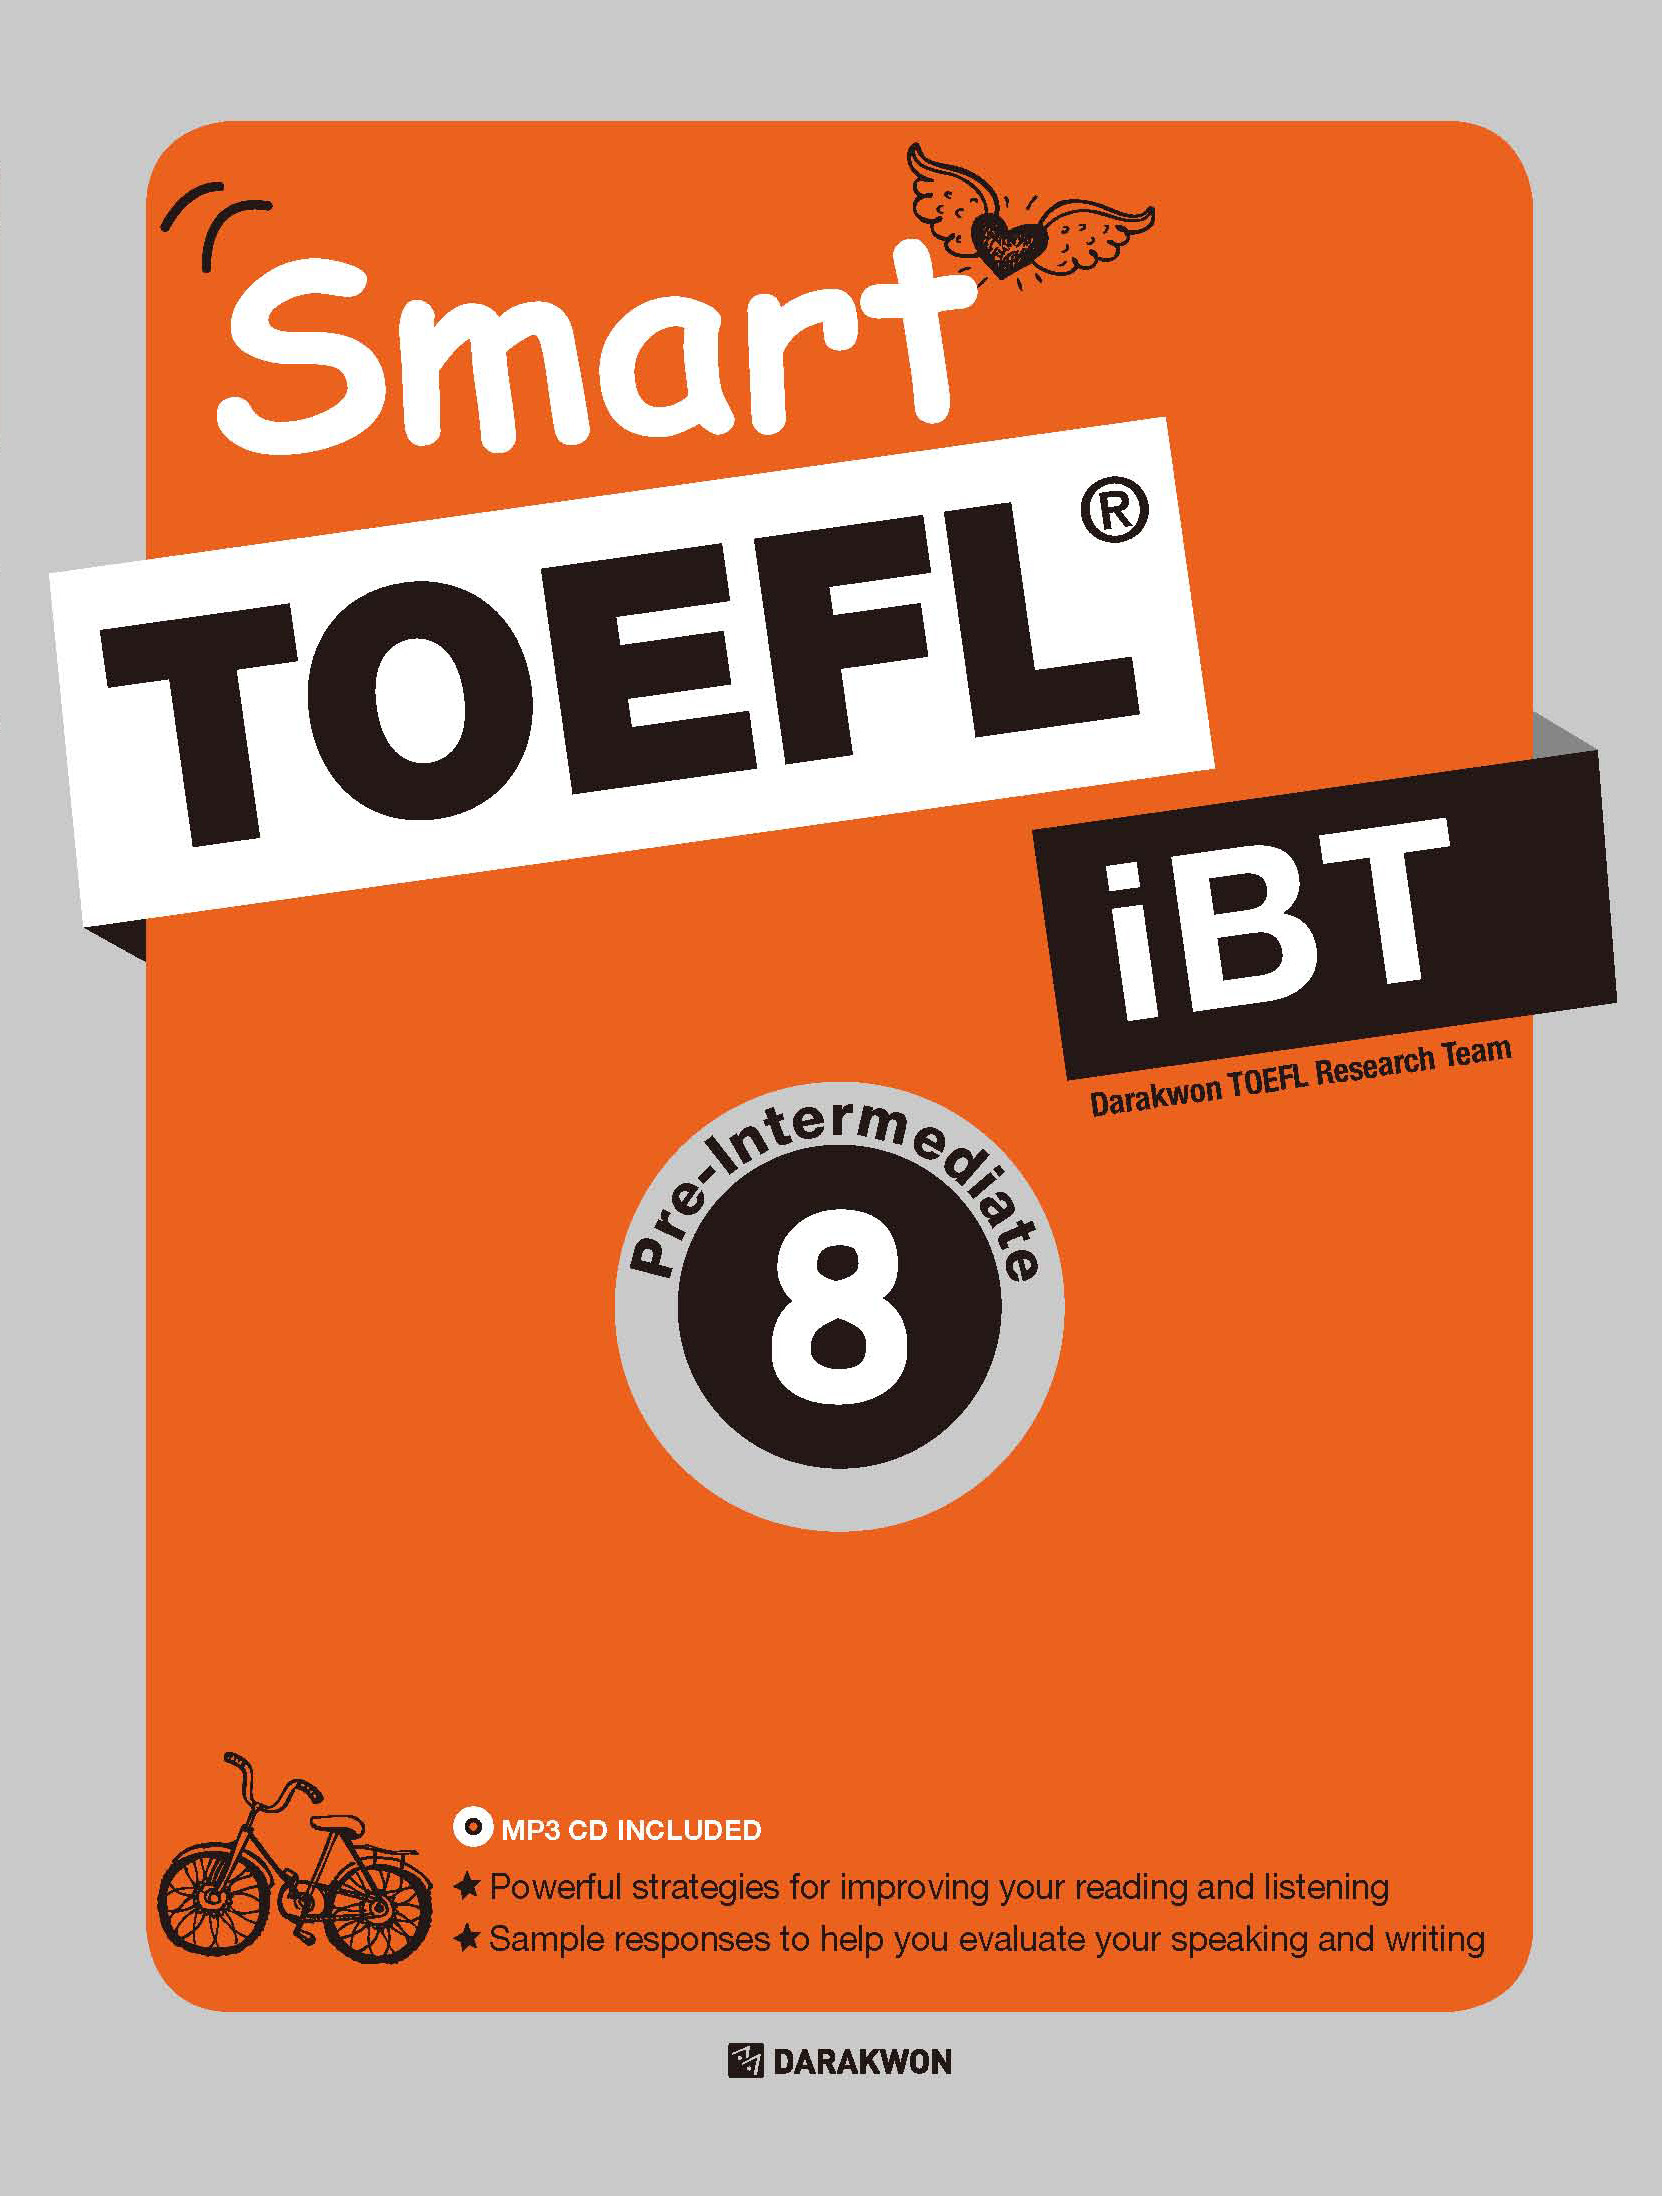 [Smart TOEFL iBT] Smart TOEFL iBT Pre-Intermediate 8